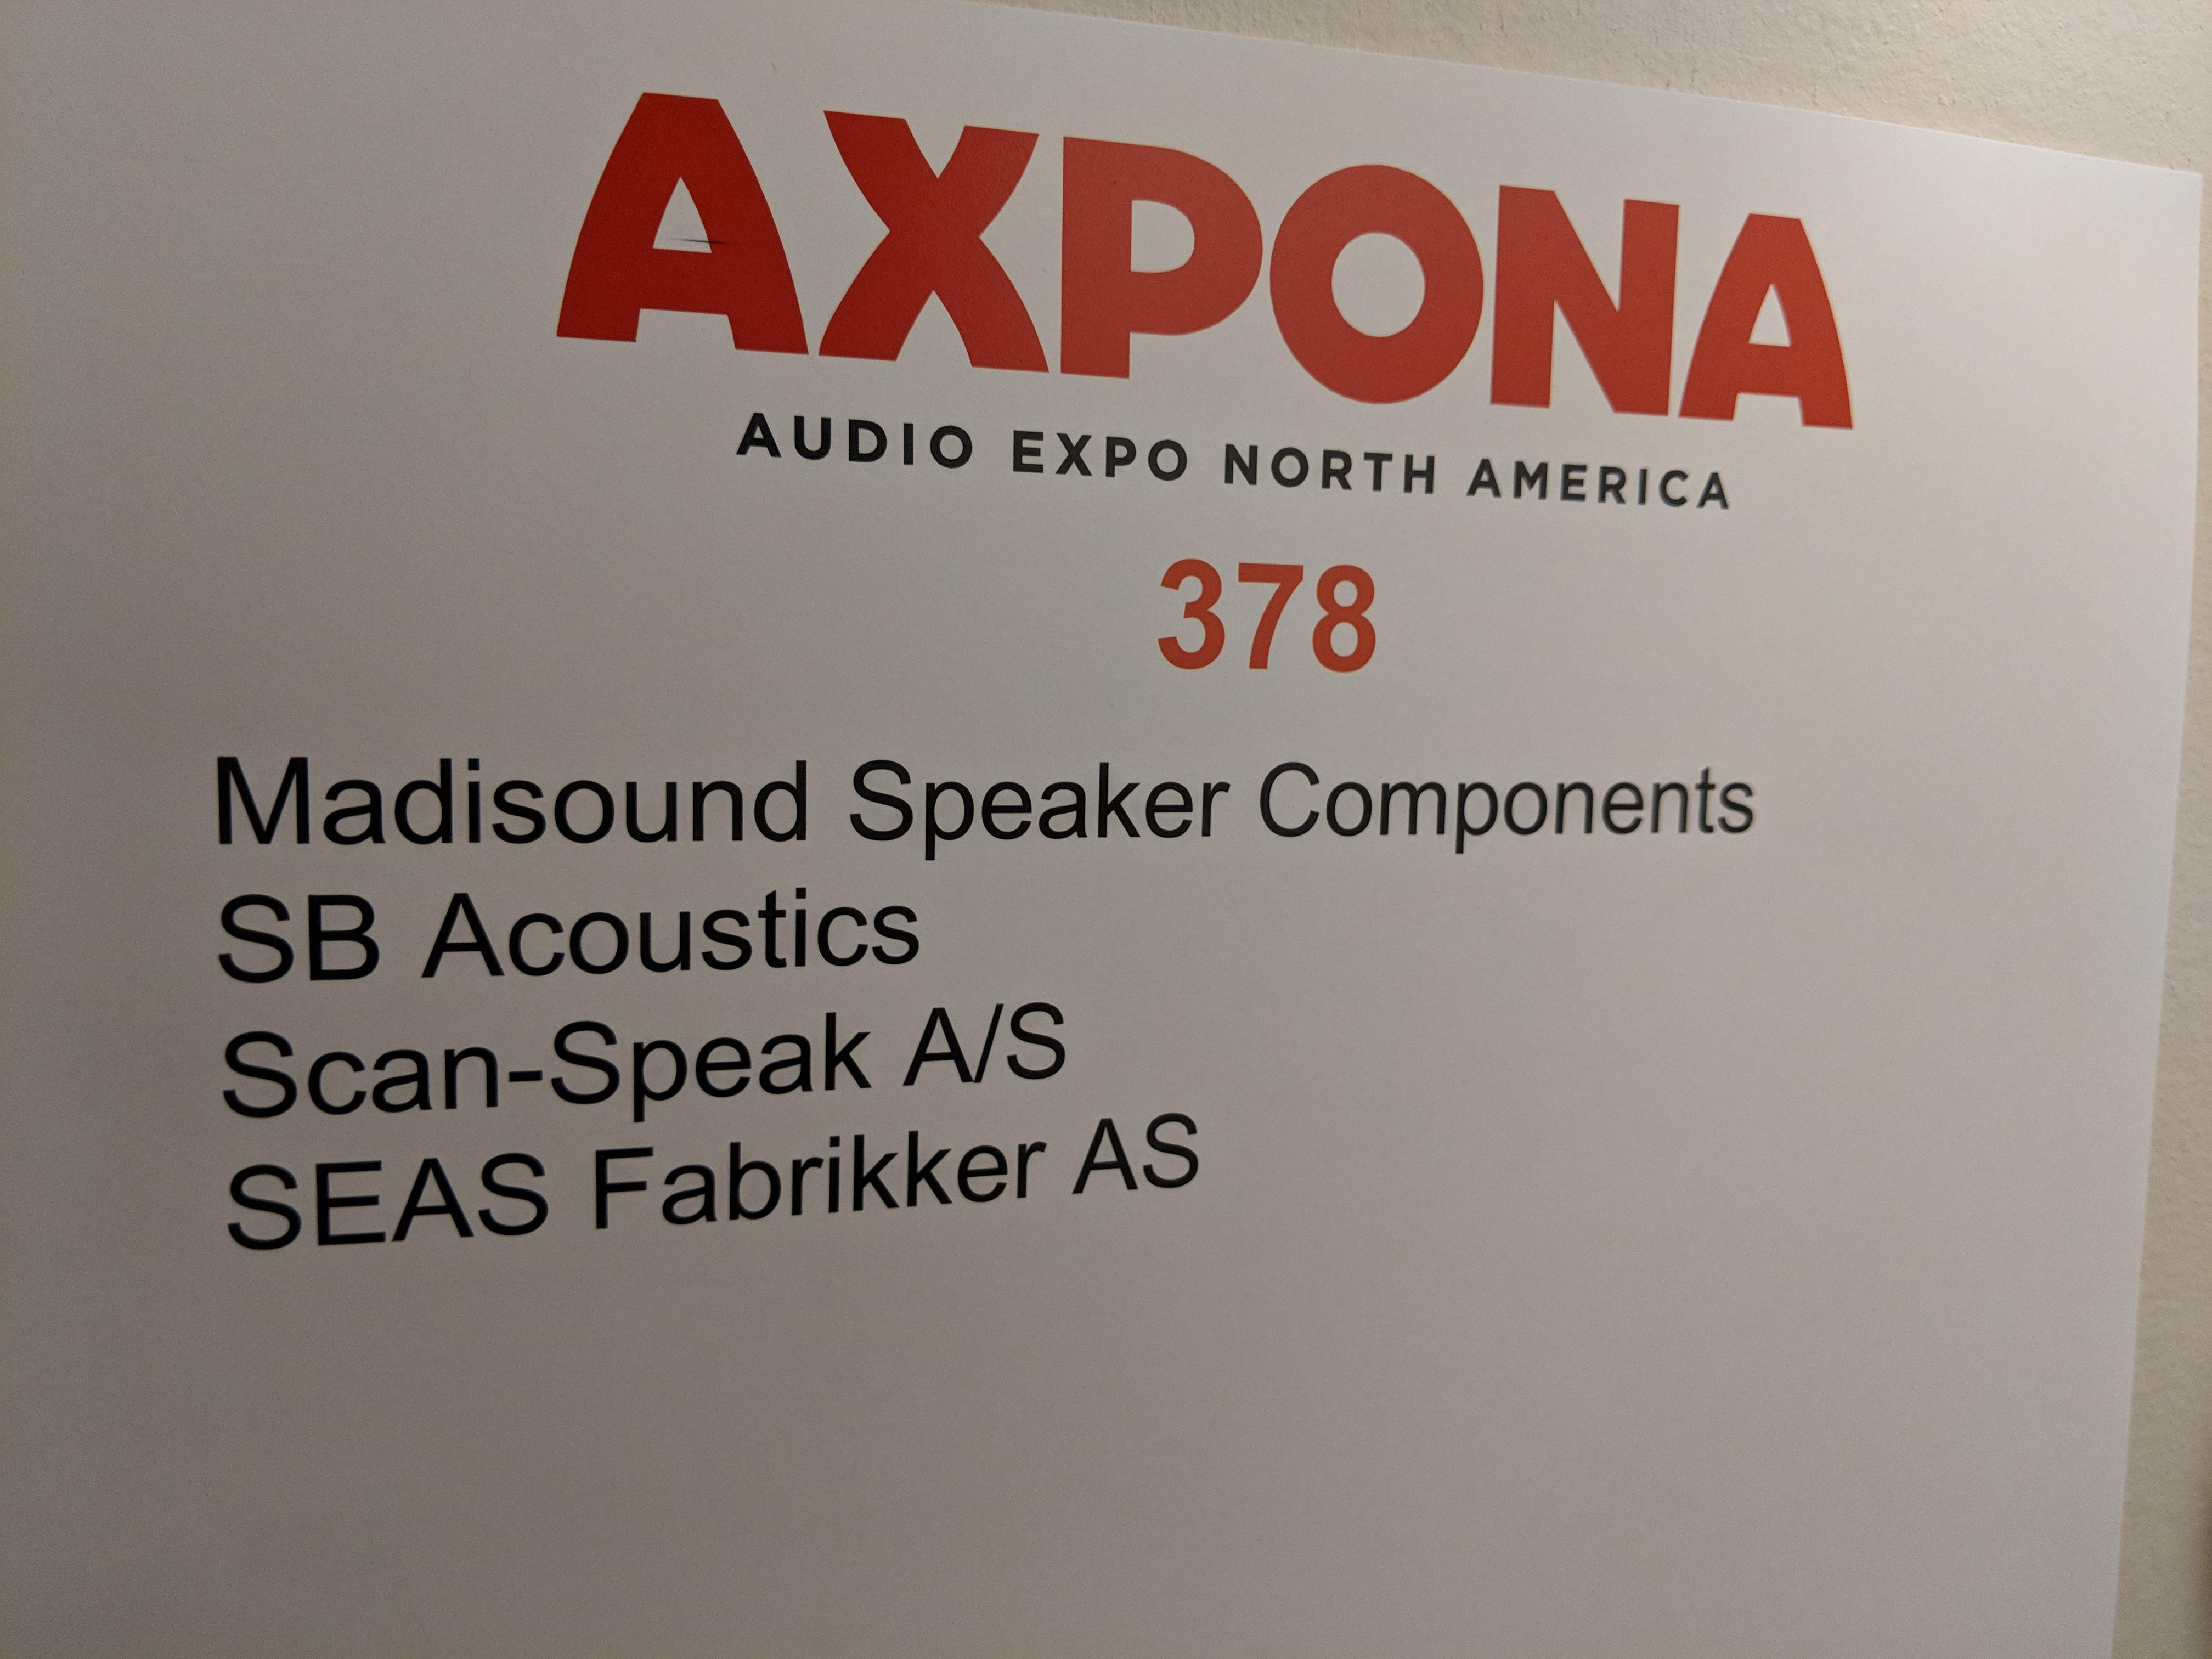 Madisound Speaker Components - Axpona 2018 - Audio Federation